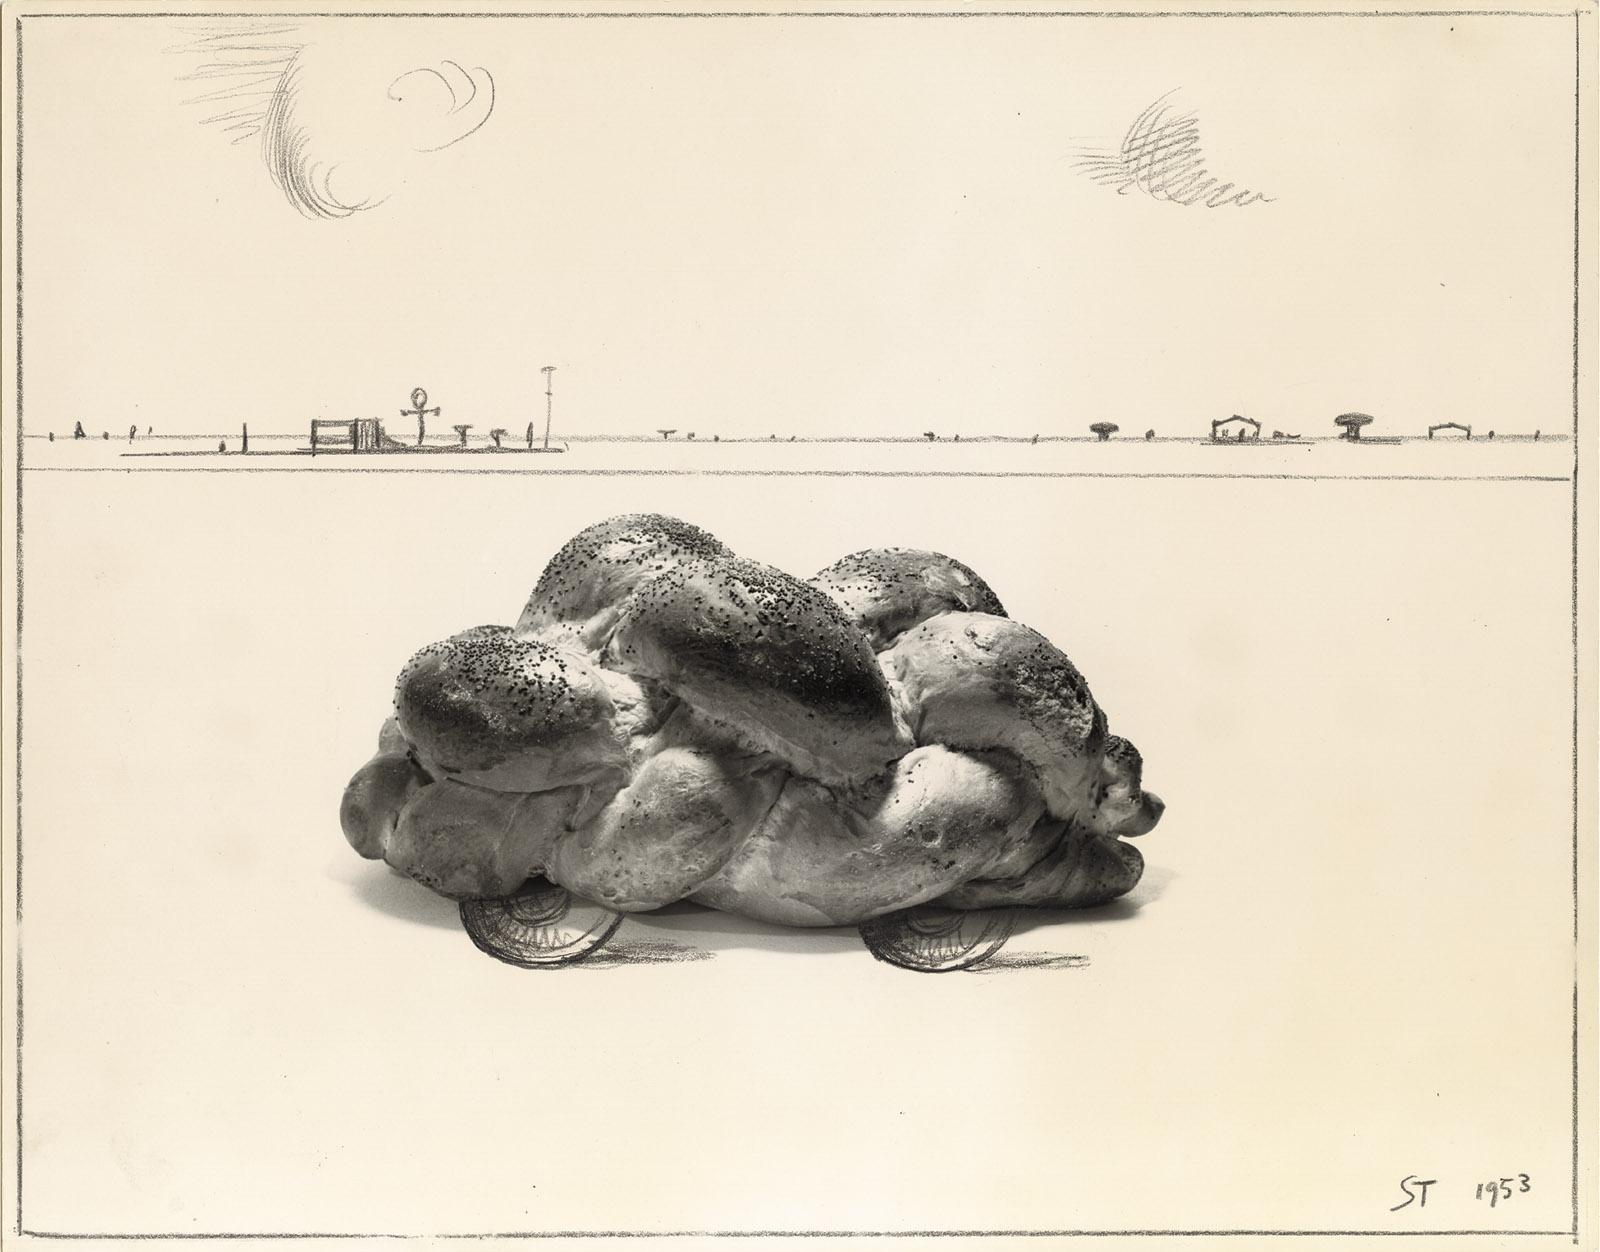 Saul Steinberg: Car, 1953